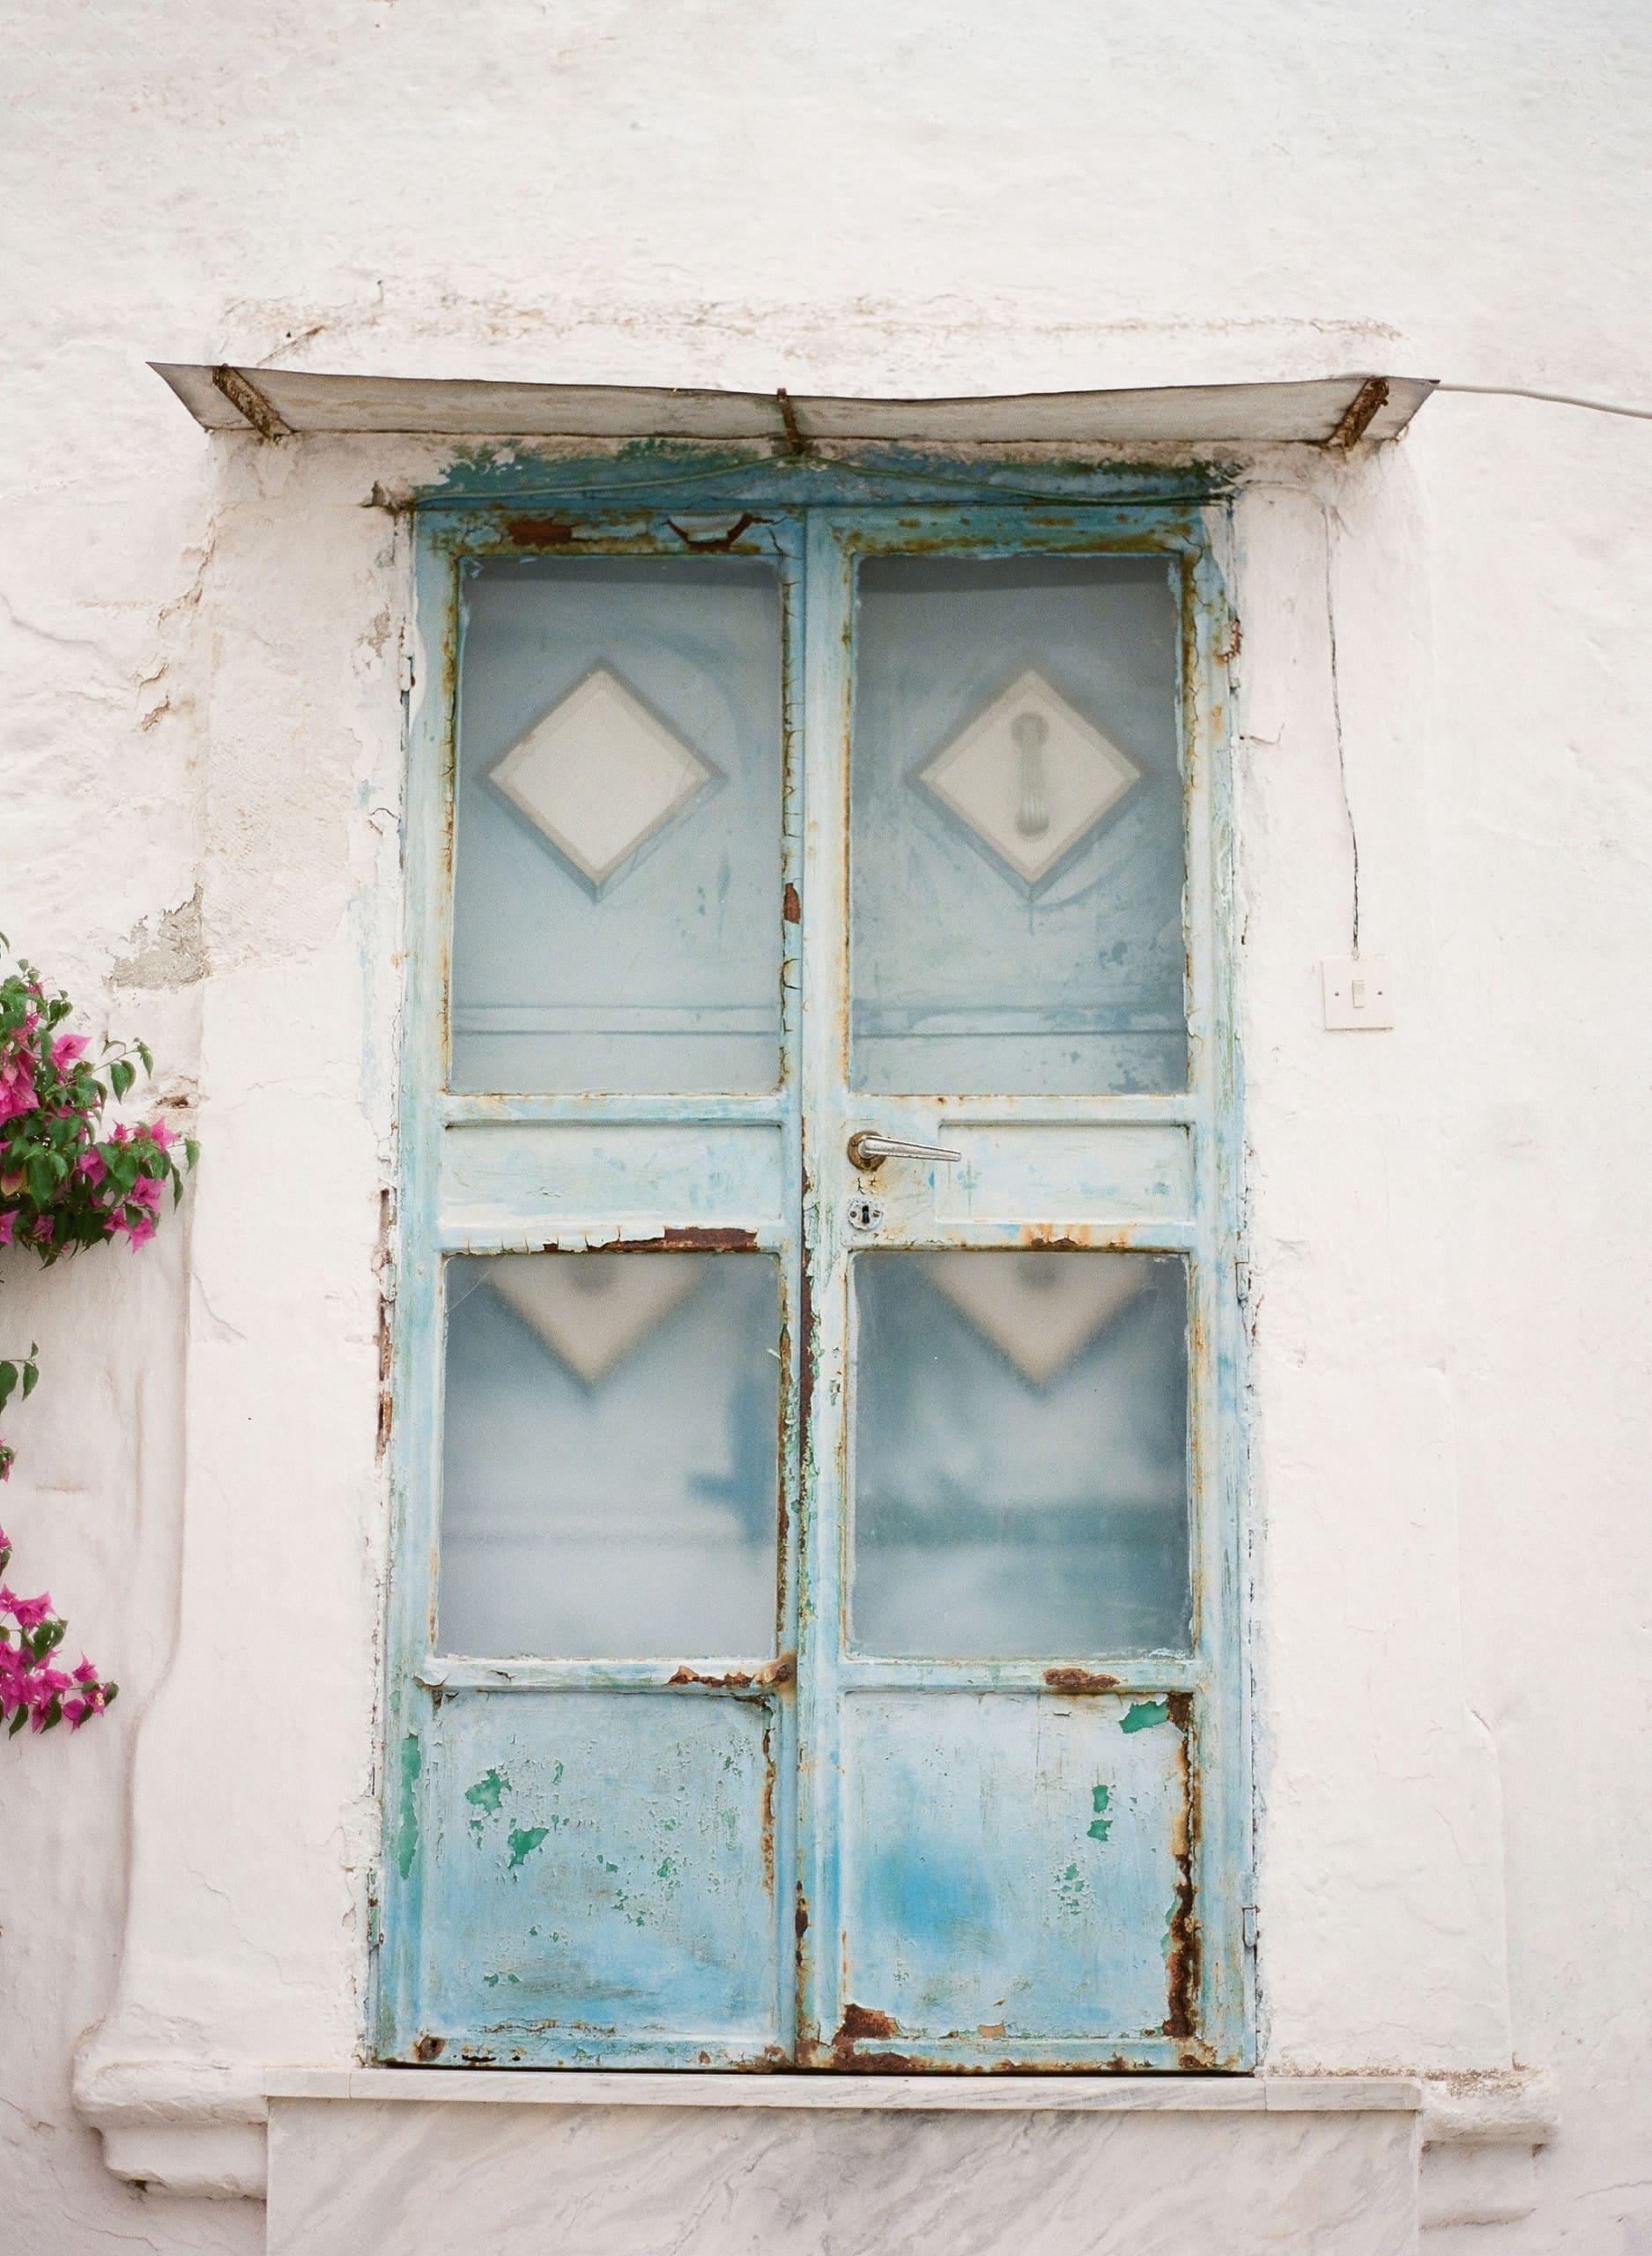 puglia italy trulli architecture buildings white travel holiday culture italian ostuni door plants flowers doorway